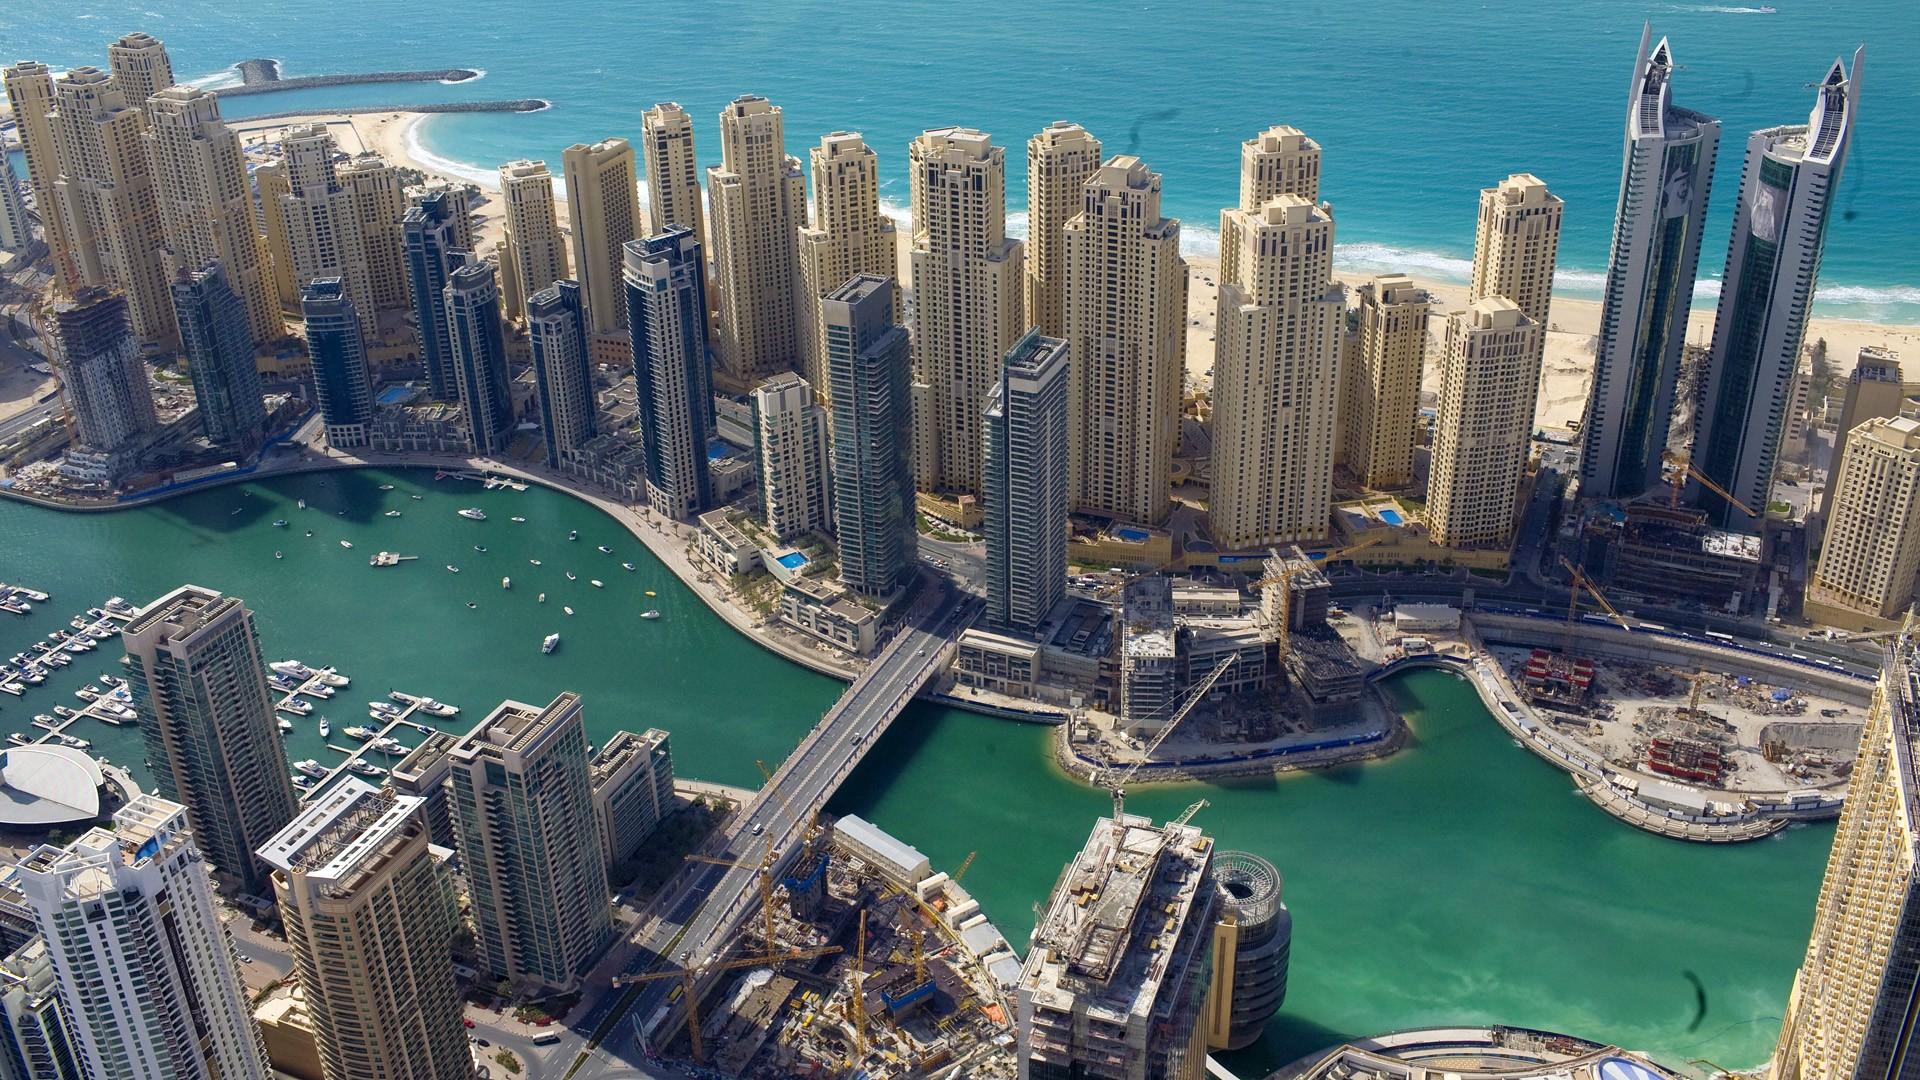 Also Dubai's real estate